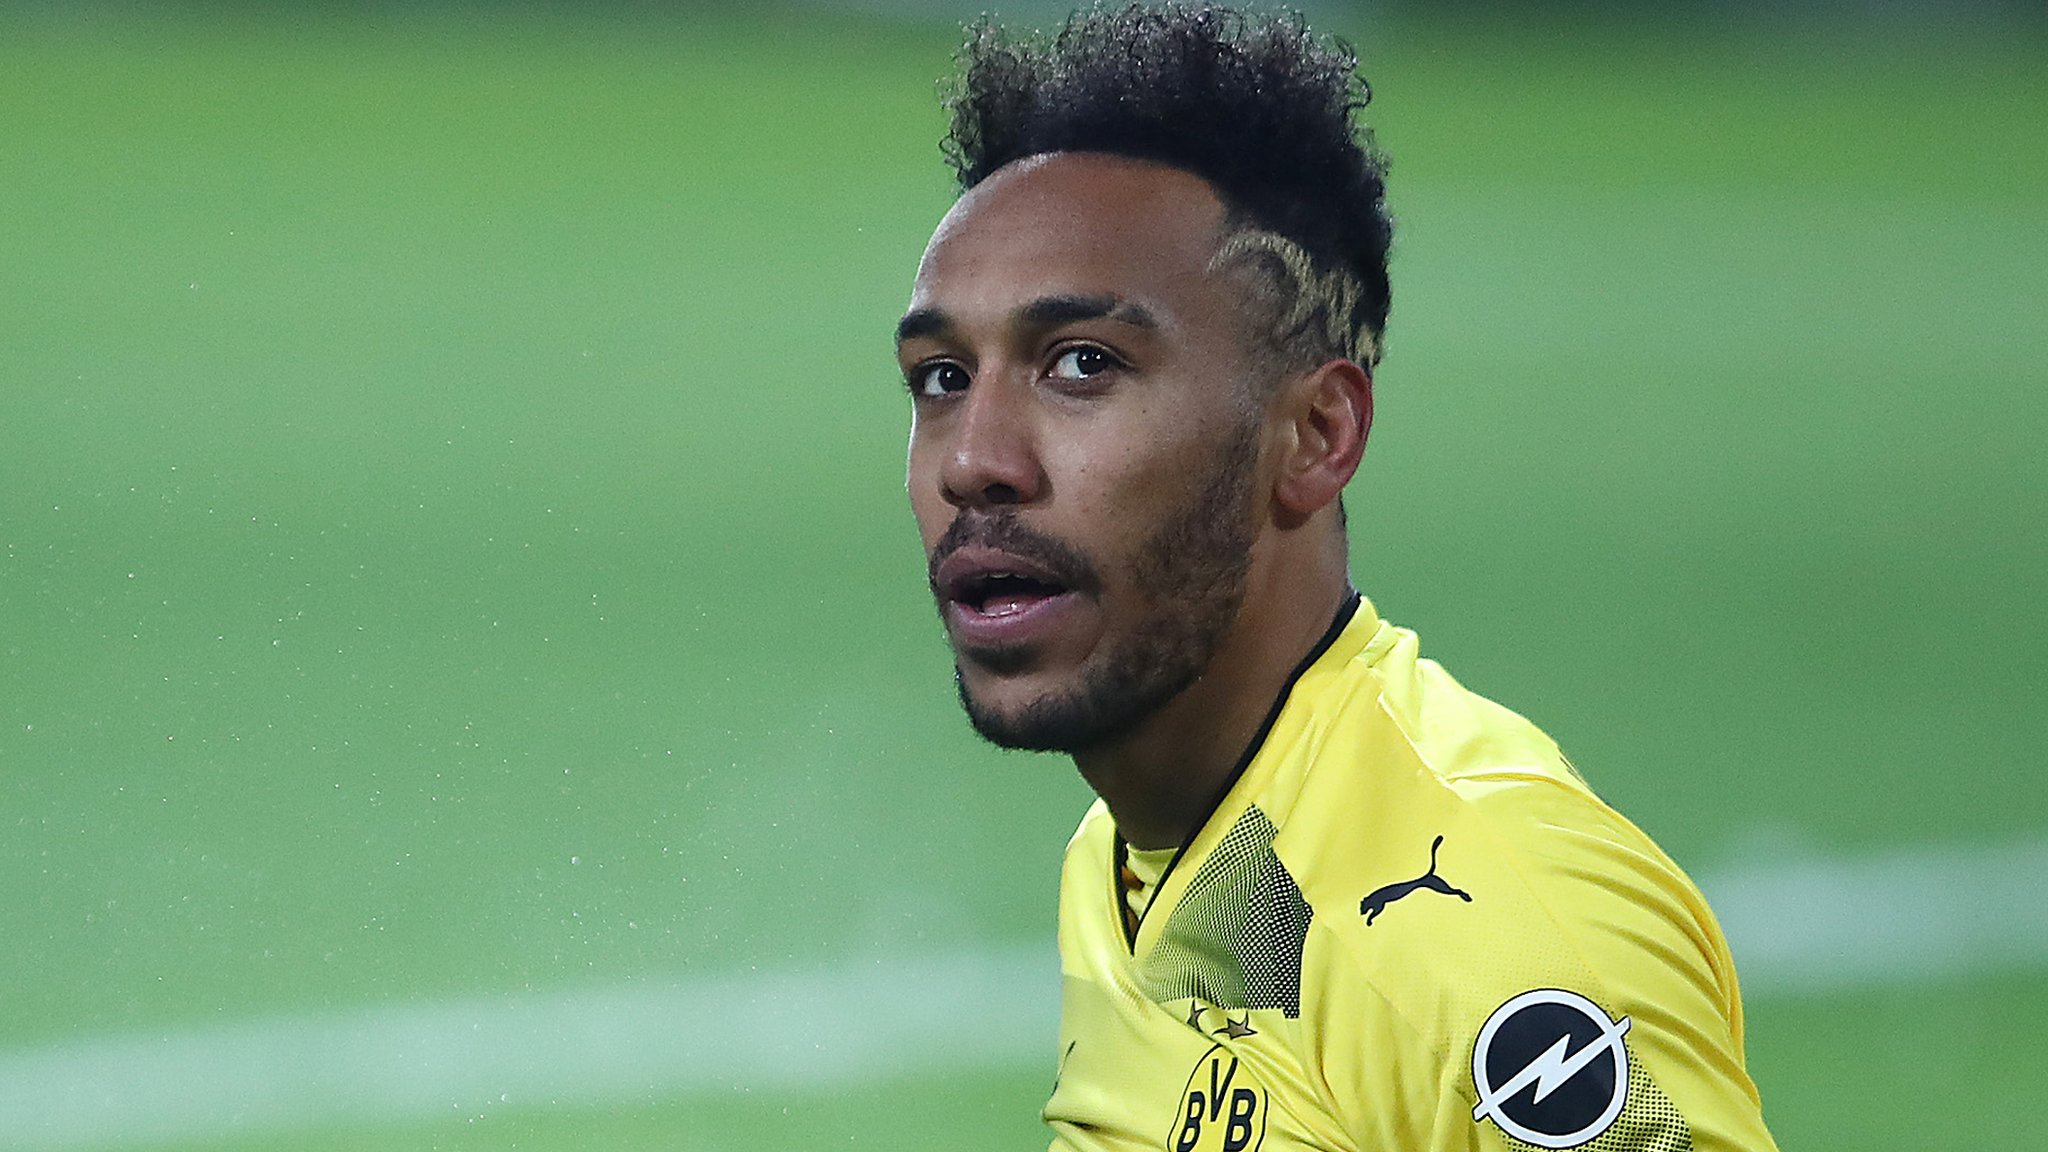 Arsenal in talks to sign £53m Aubameyang - gossip